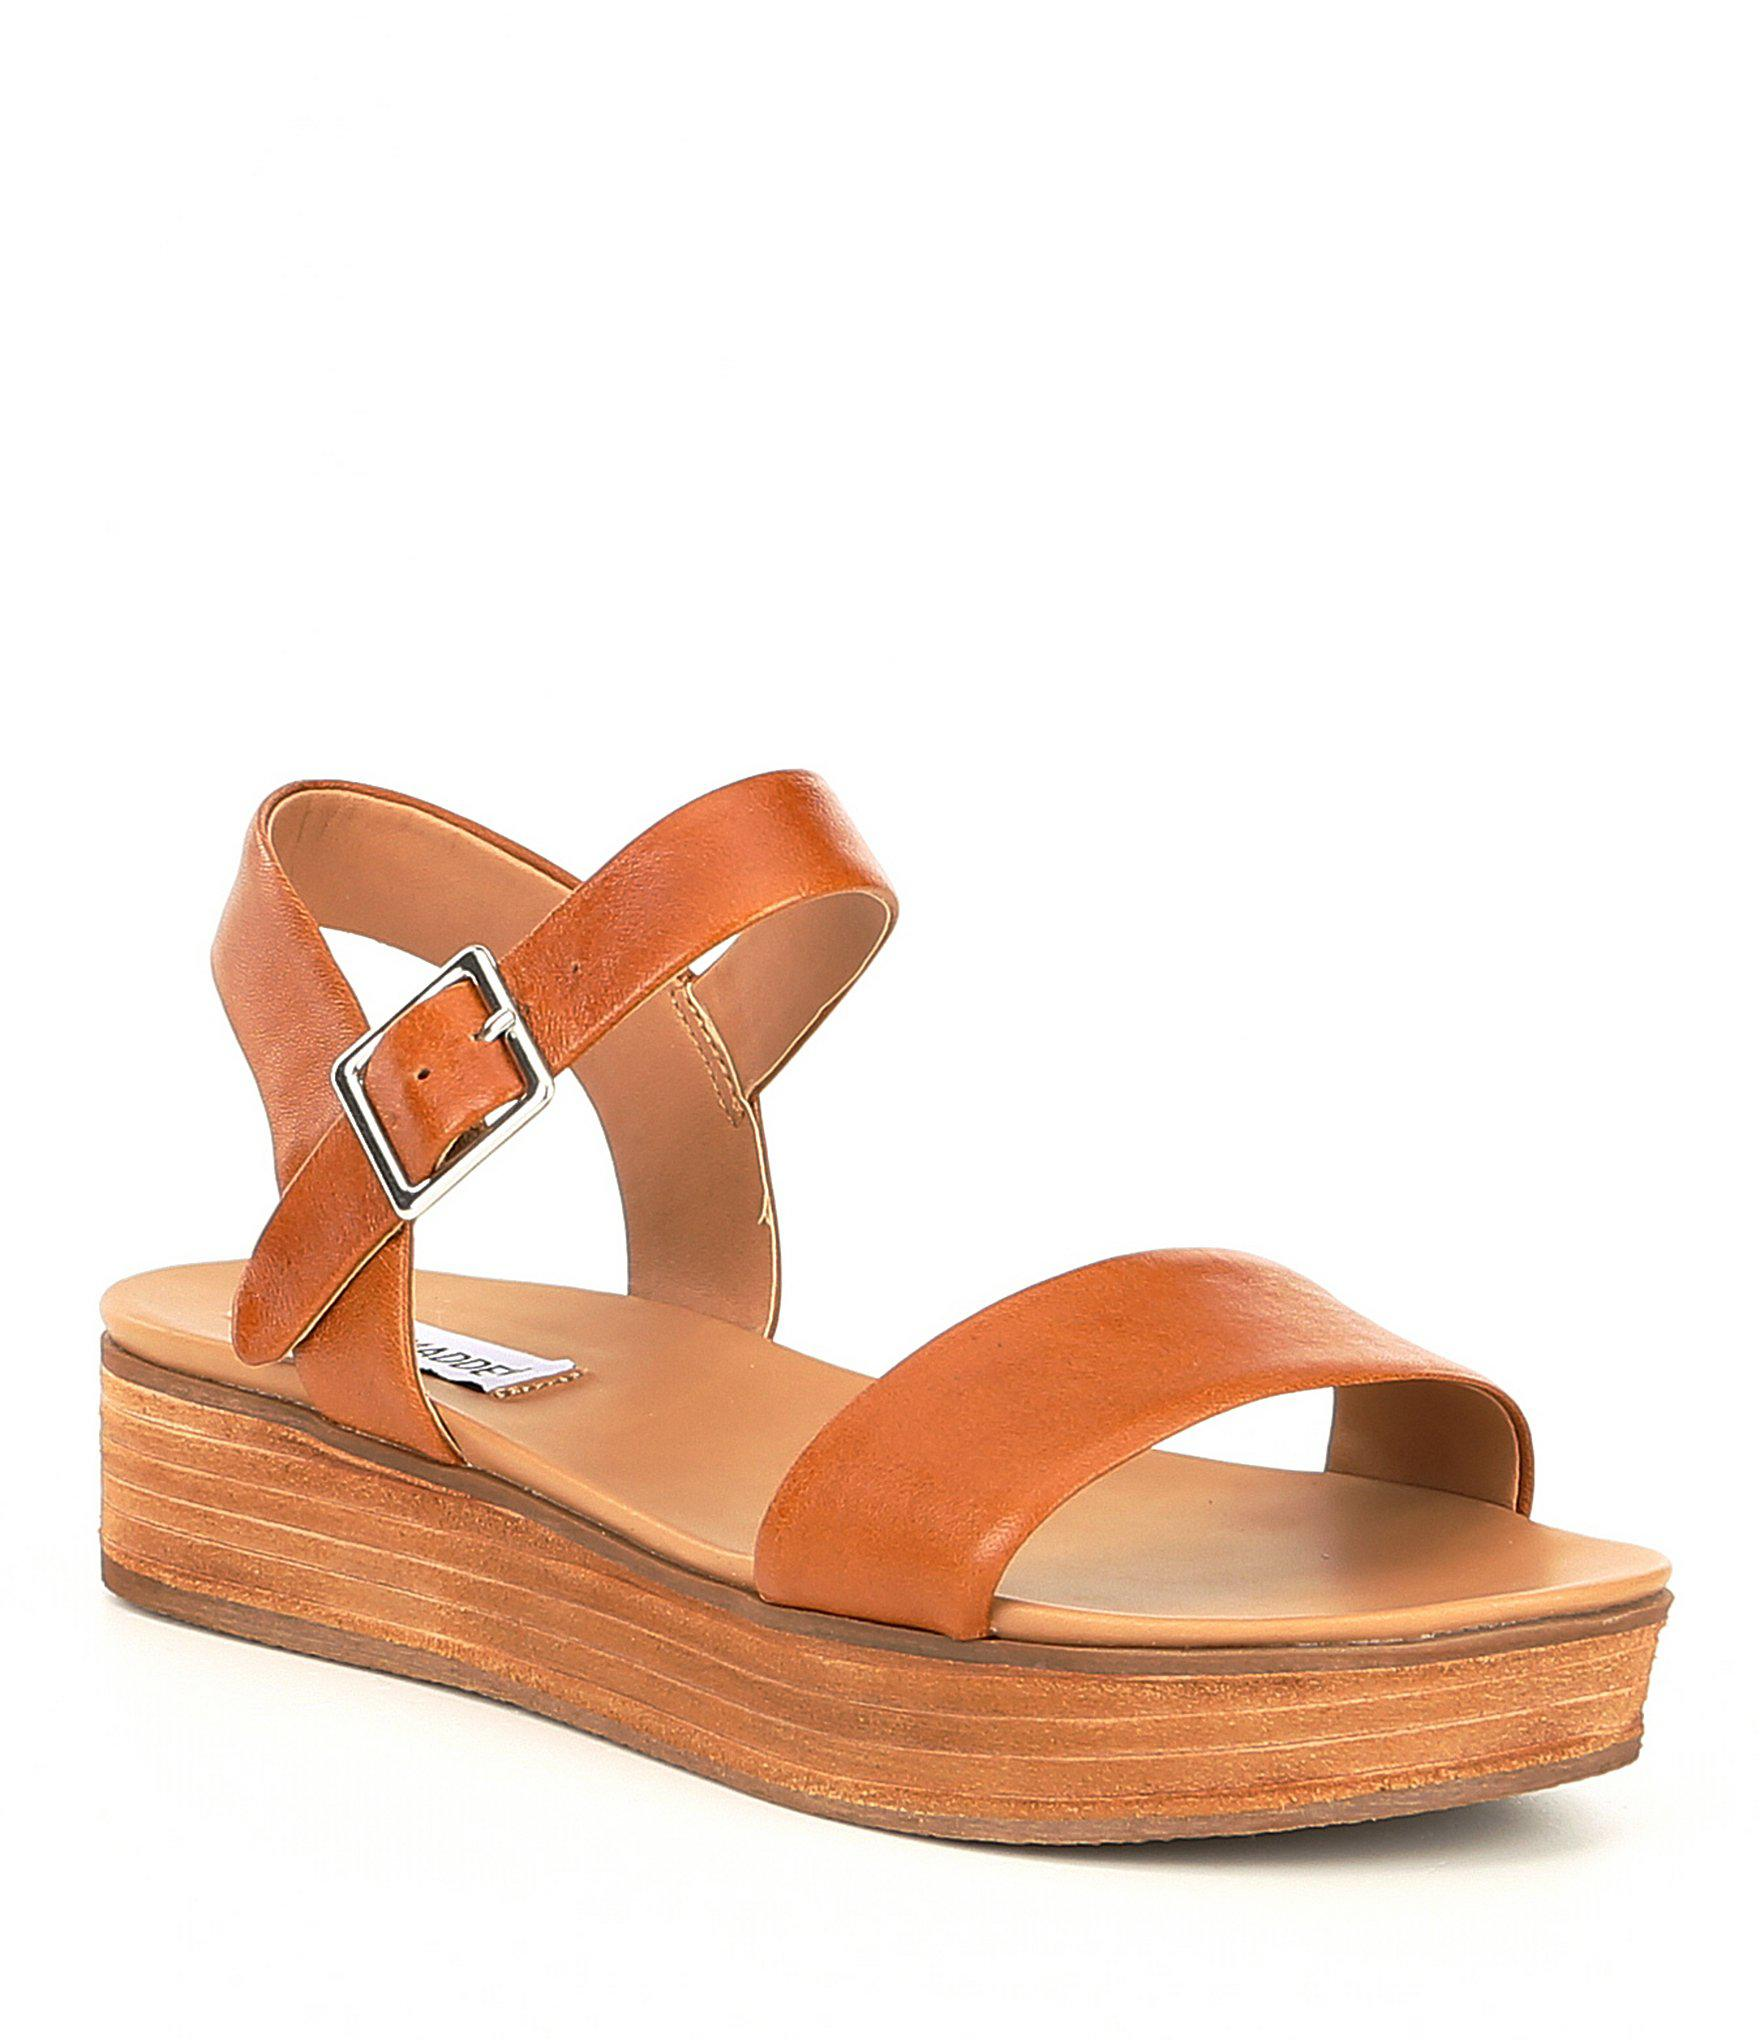 88eeb7683dd Lyst - Steve Madden Aida Platform Sandals in Brown